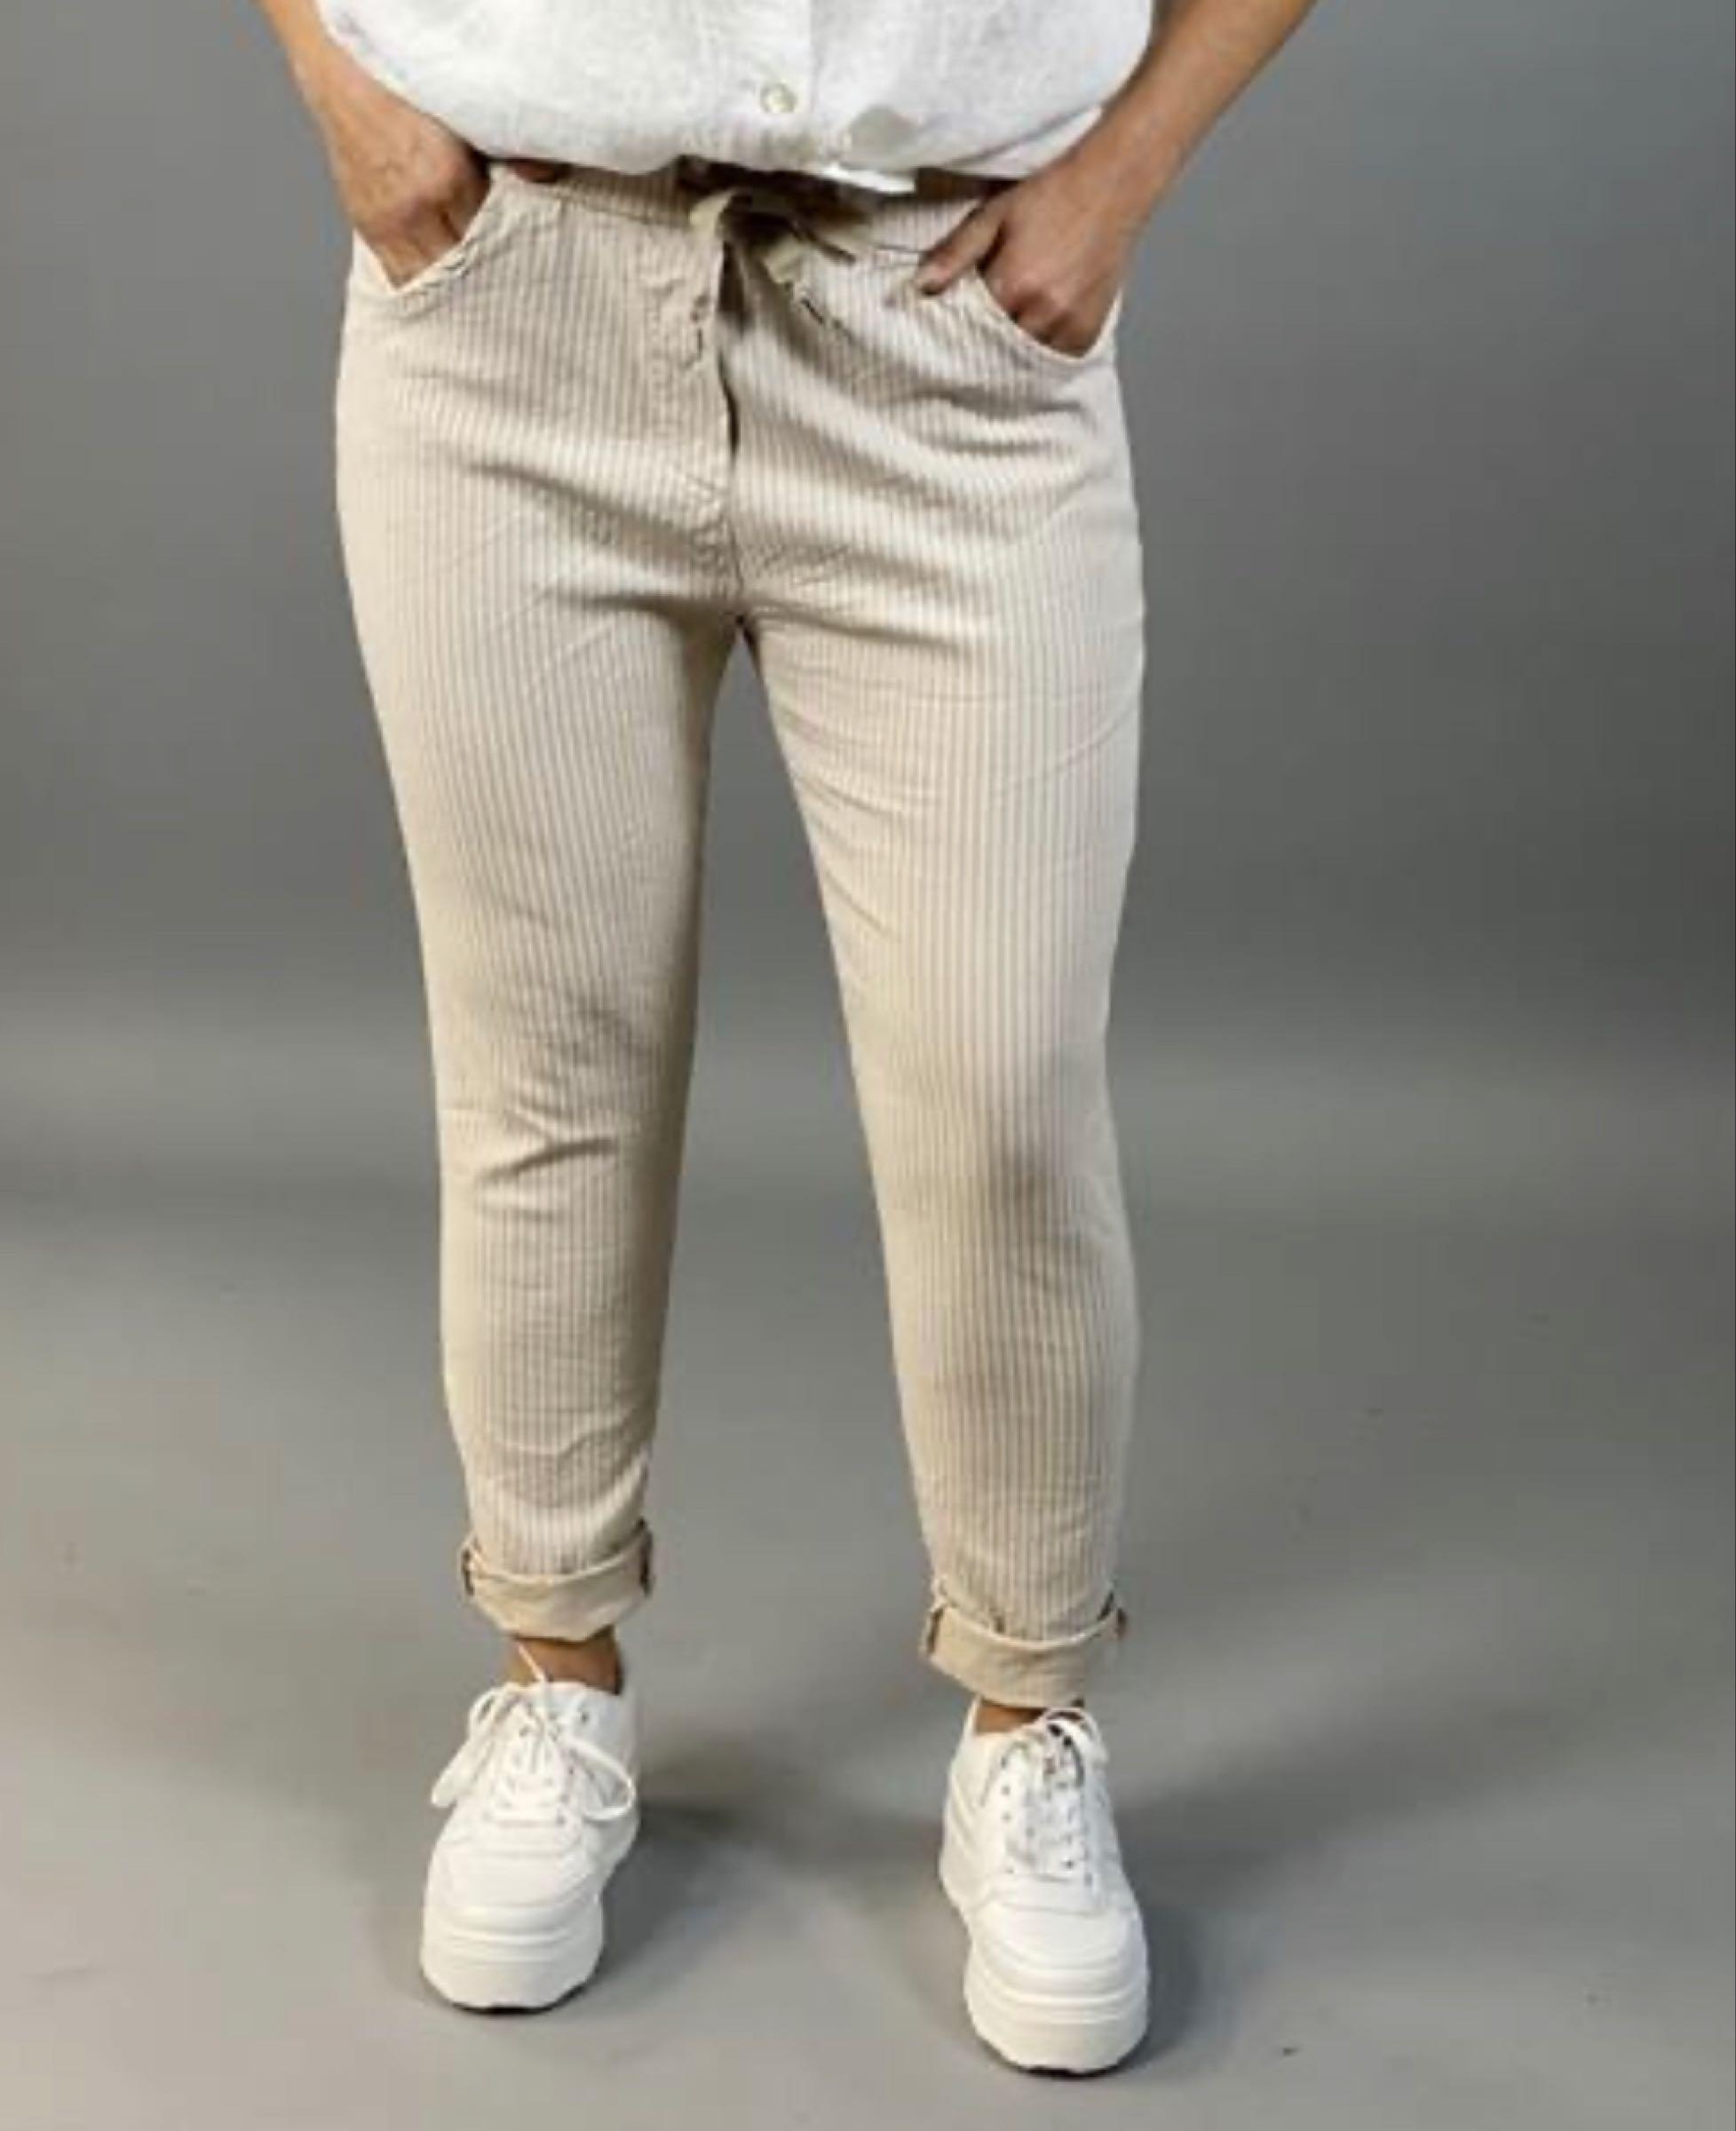 SIGNE stretchbyxa, beige rand